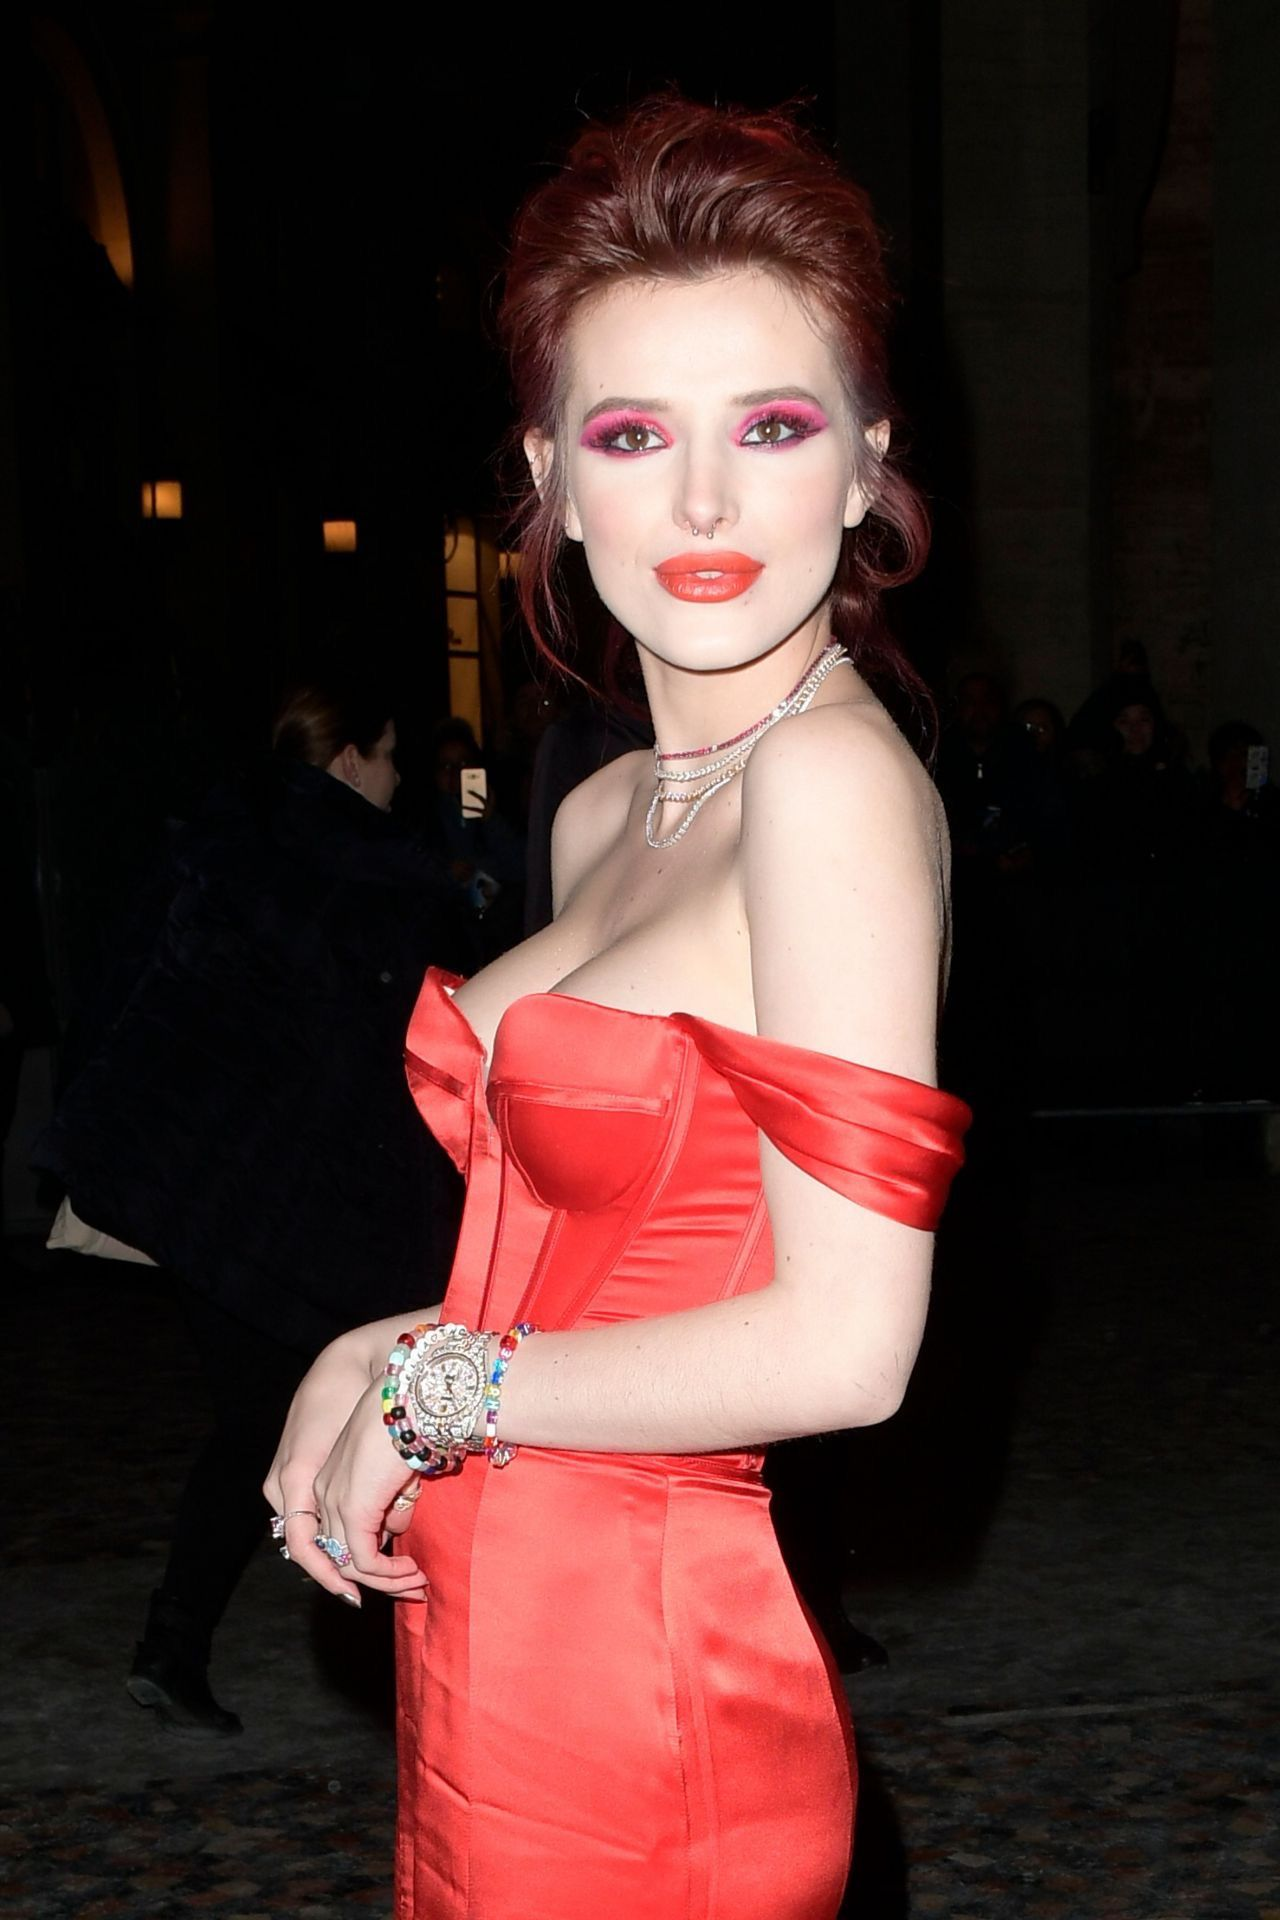 ICloud Annabella Thorne nude photos 2019